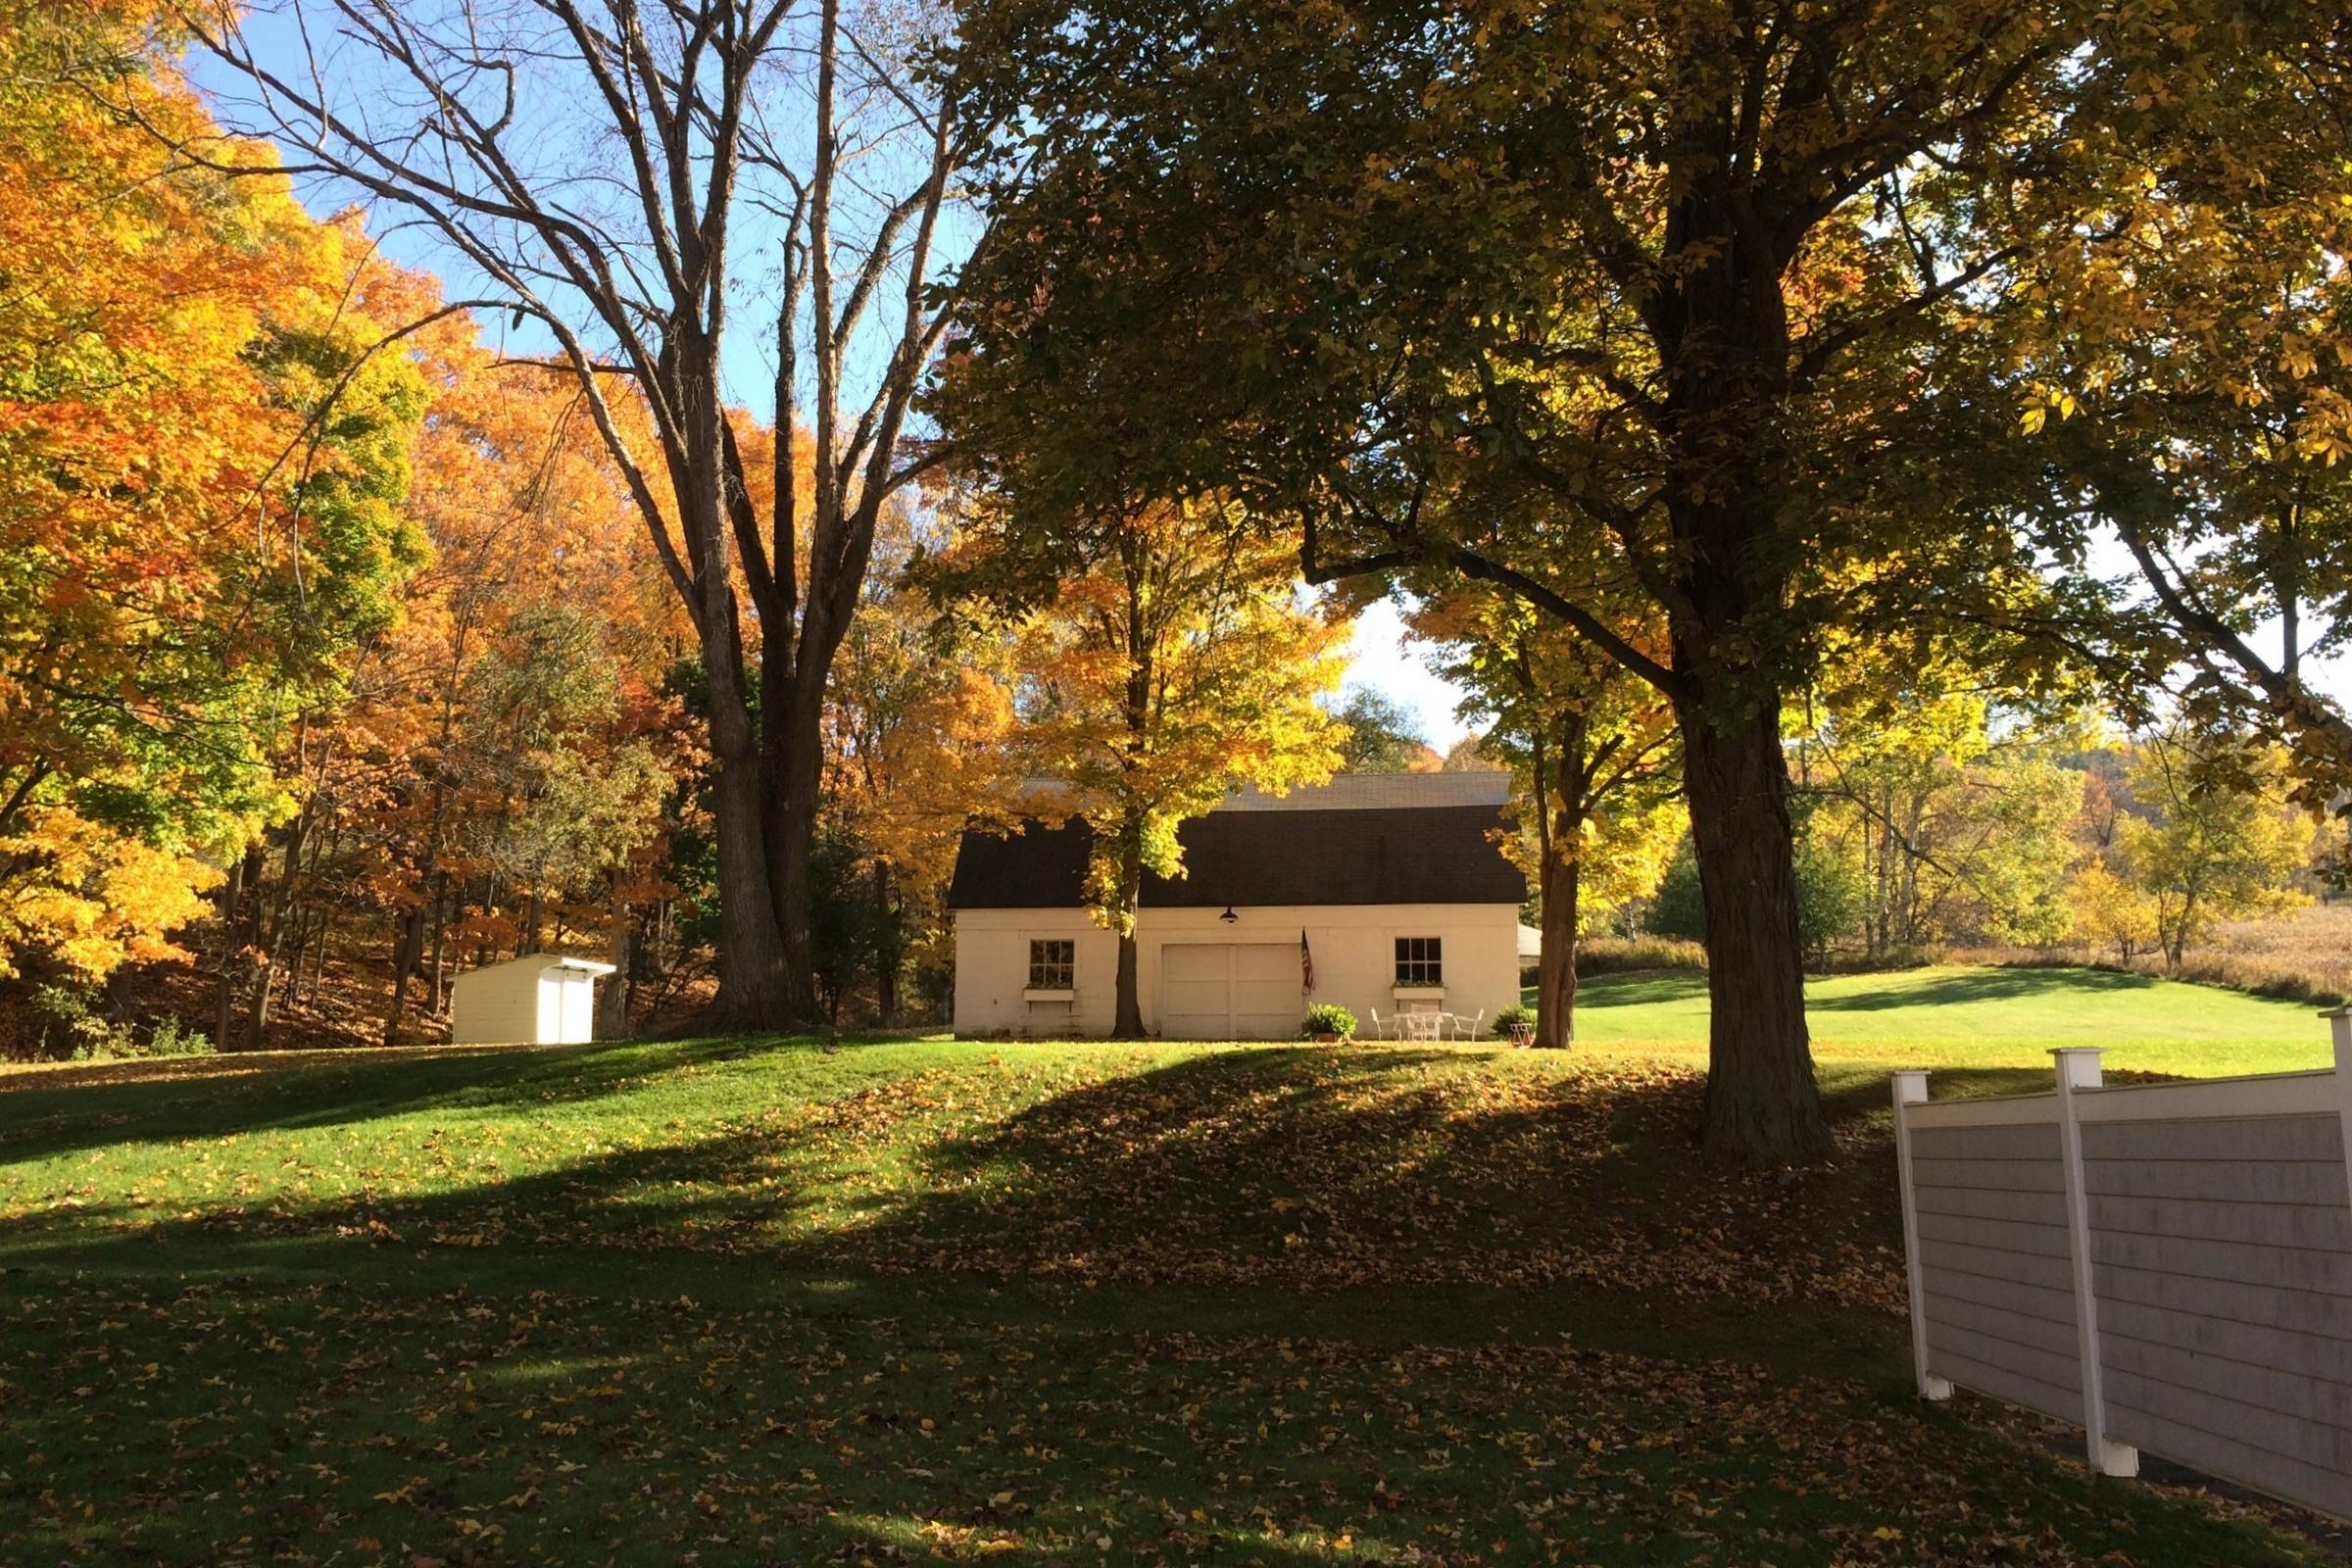 Barn from House Fall Leaves.JPG